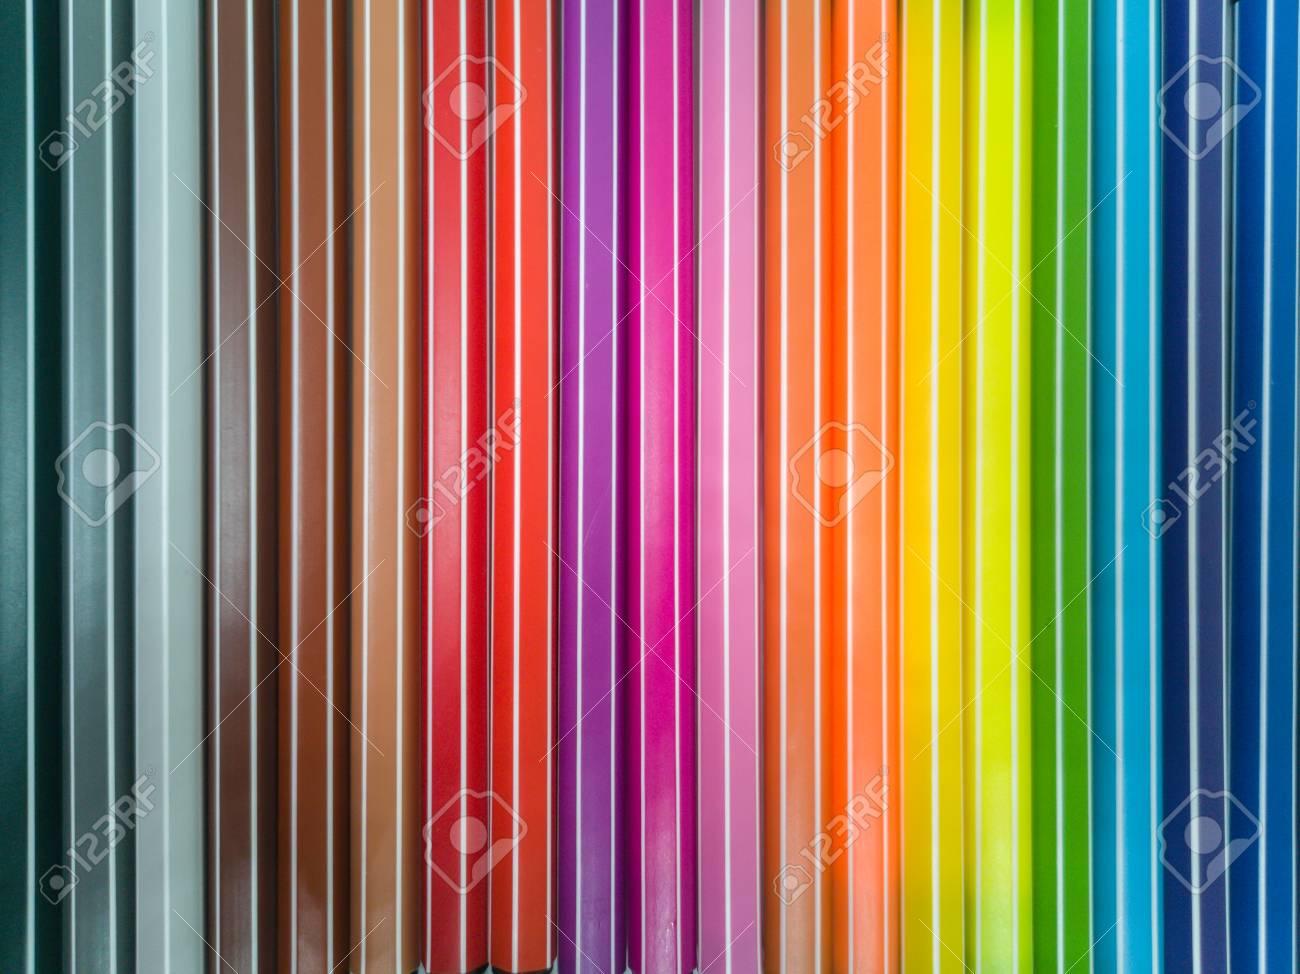 Set of colorful marker paint pen vibrant background - 106223056